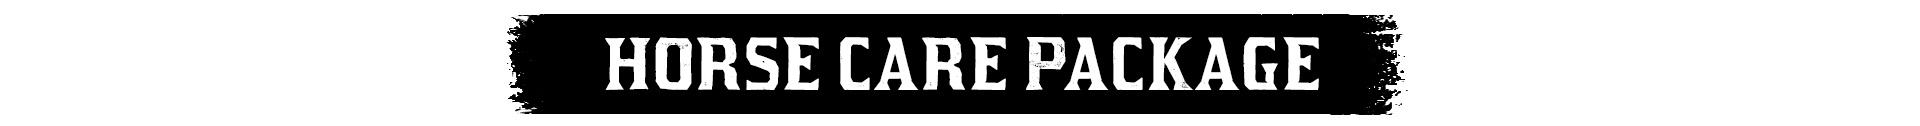 https://media.rockstargames.com/rockstargames-newsite/uploads/58f204f9502f5e1d0c529176824259bc6c8498e2.png